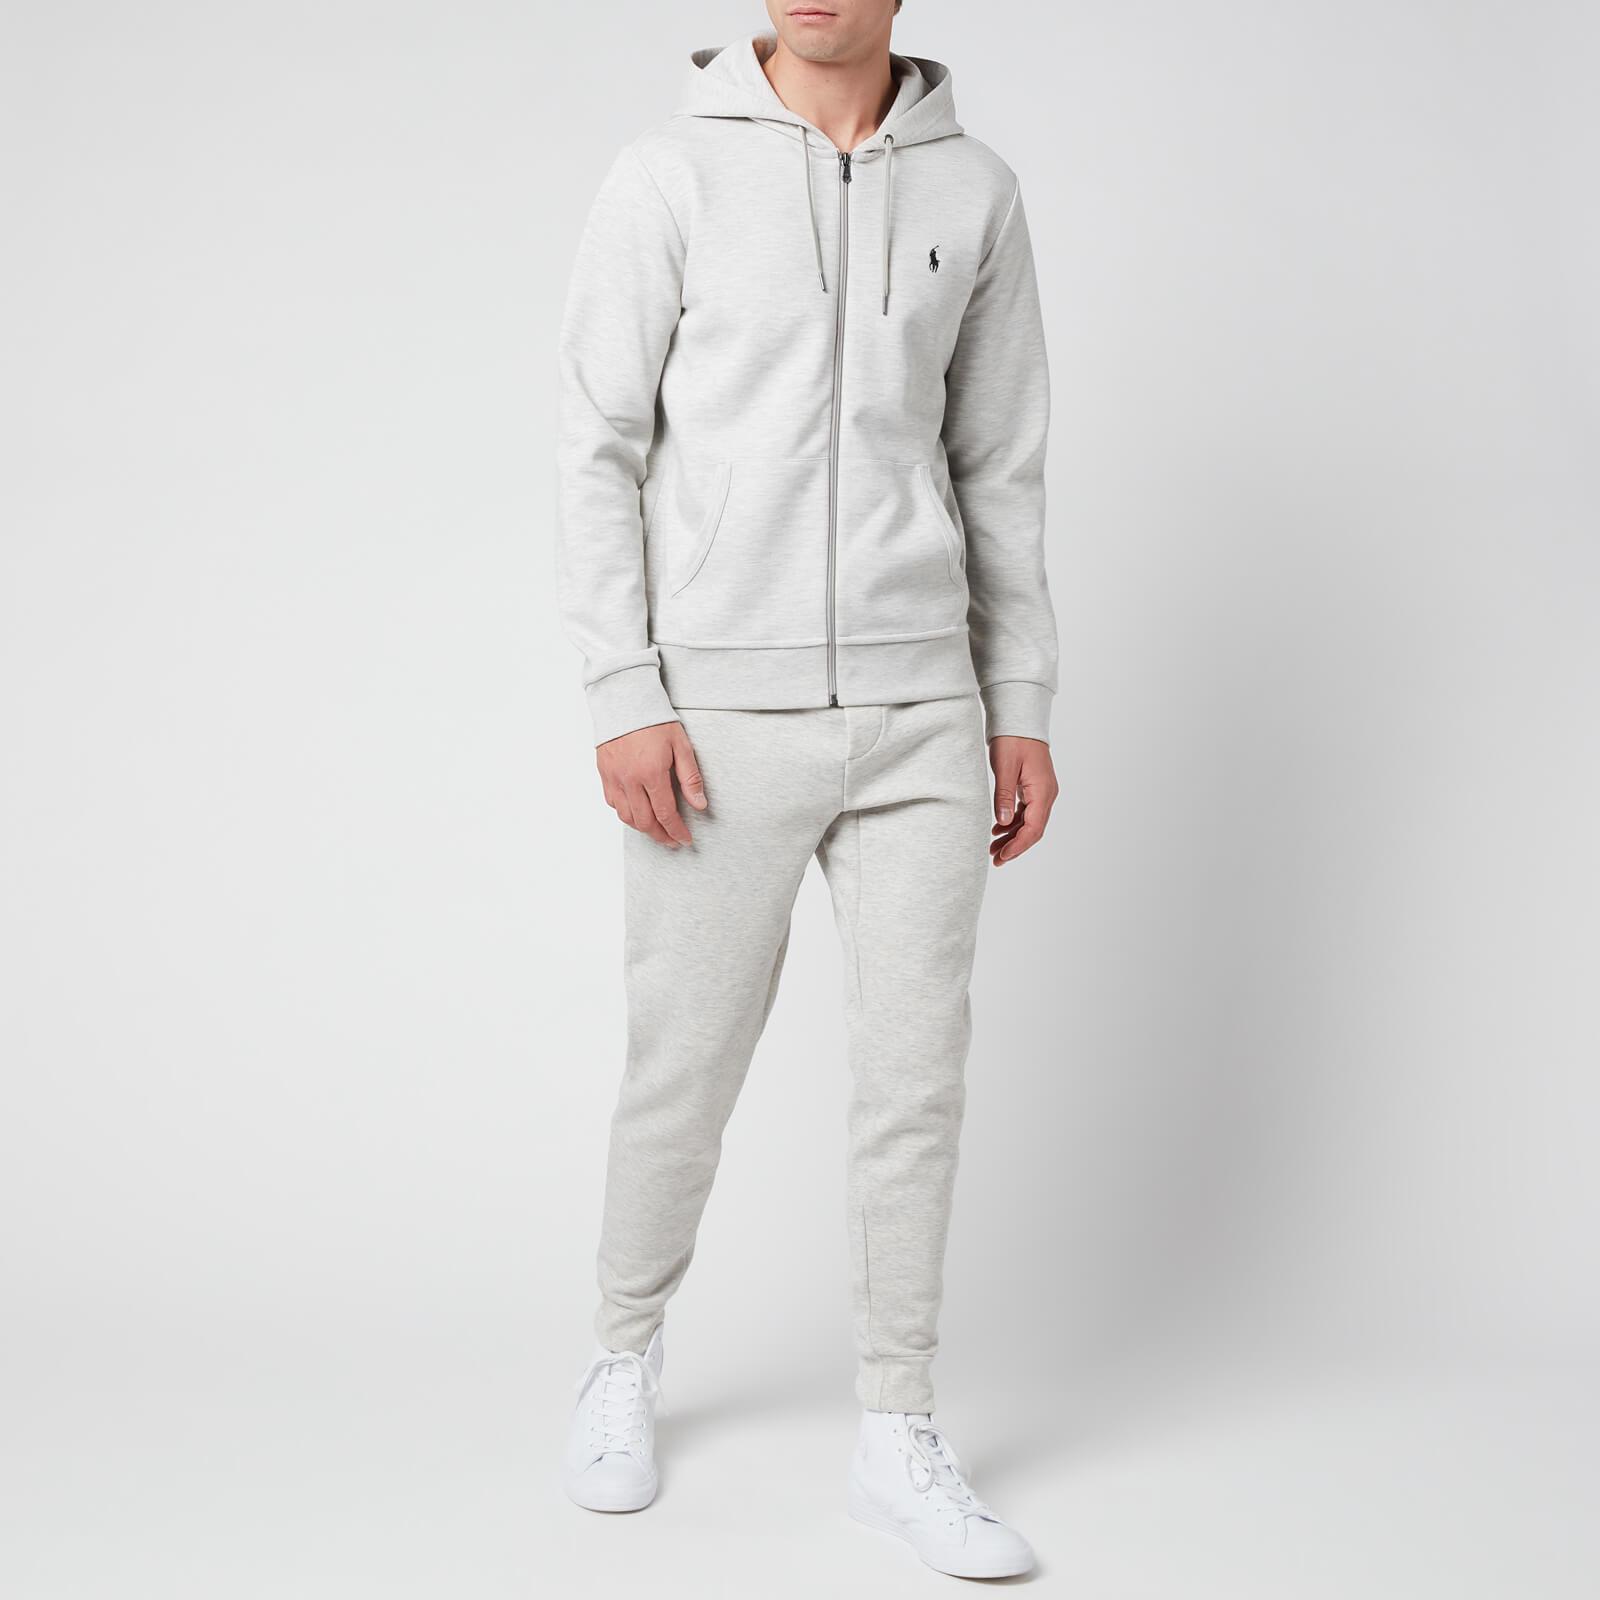 Polo Ralph Lauren Men's Double Knit Joggers - Sport Heather - M 710652314013 Mens Clothing, Grey